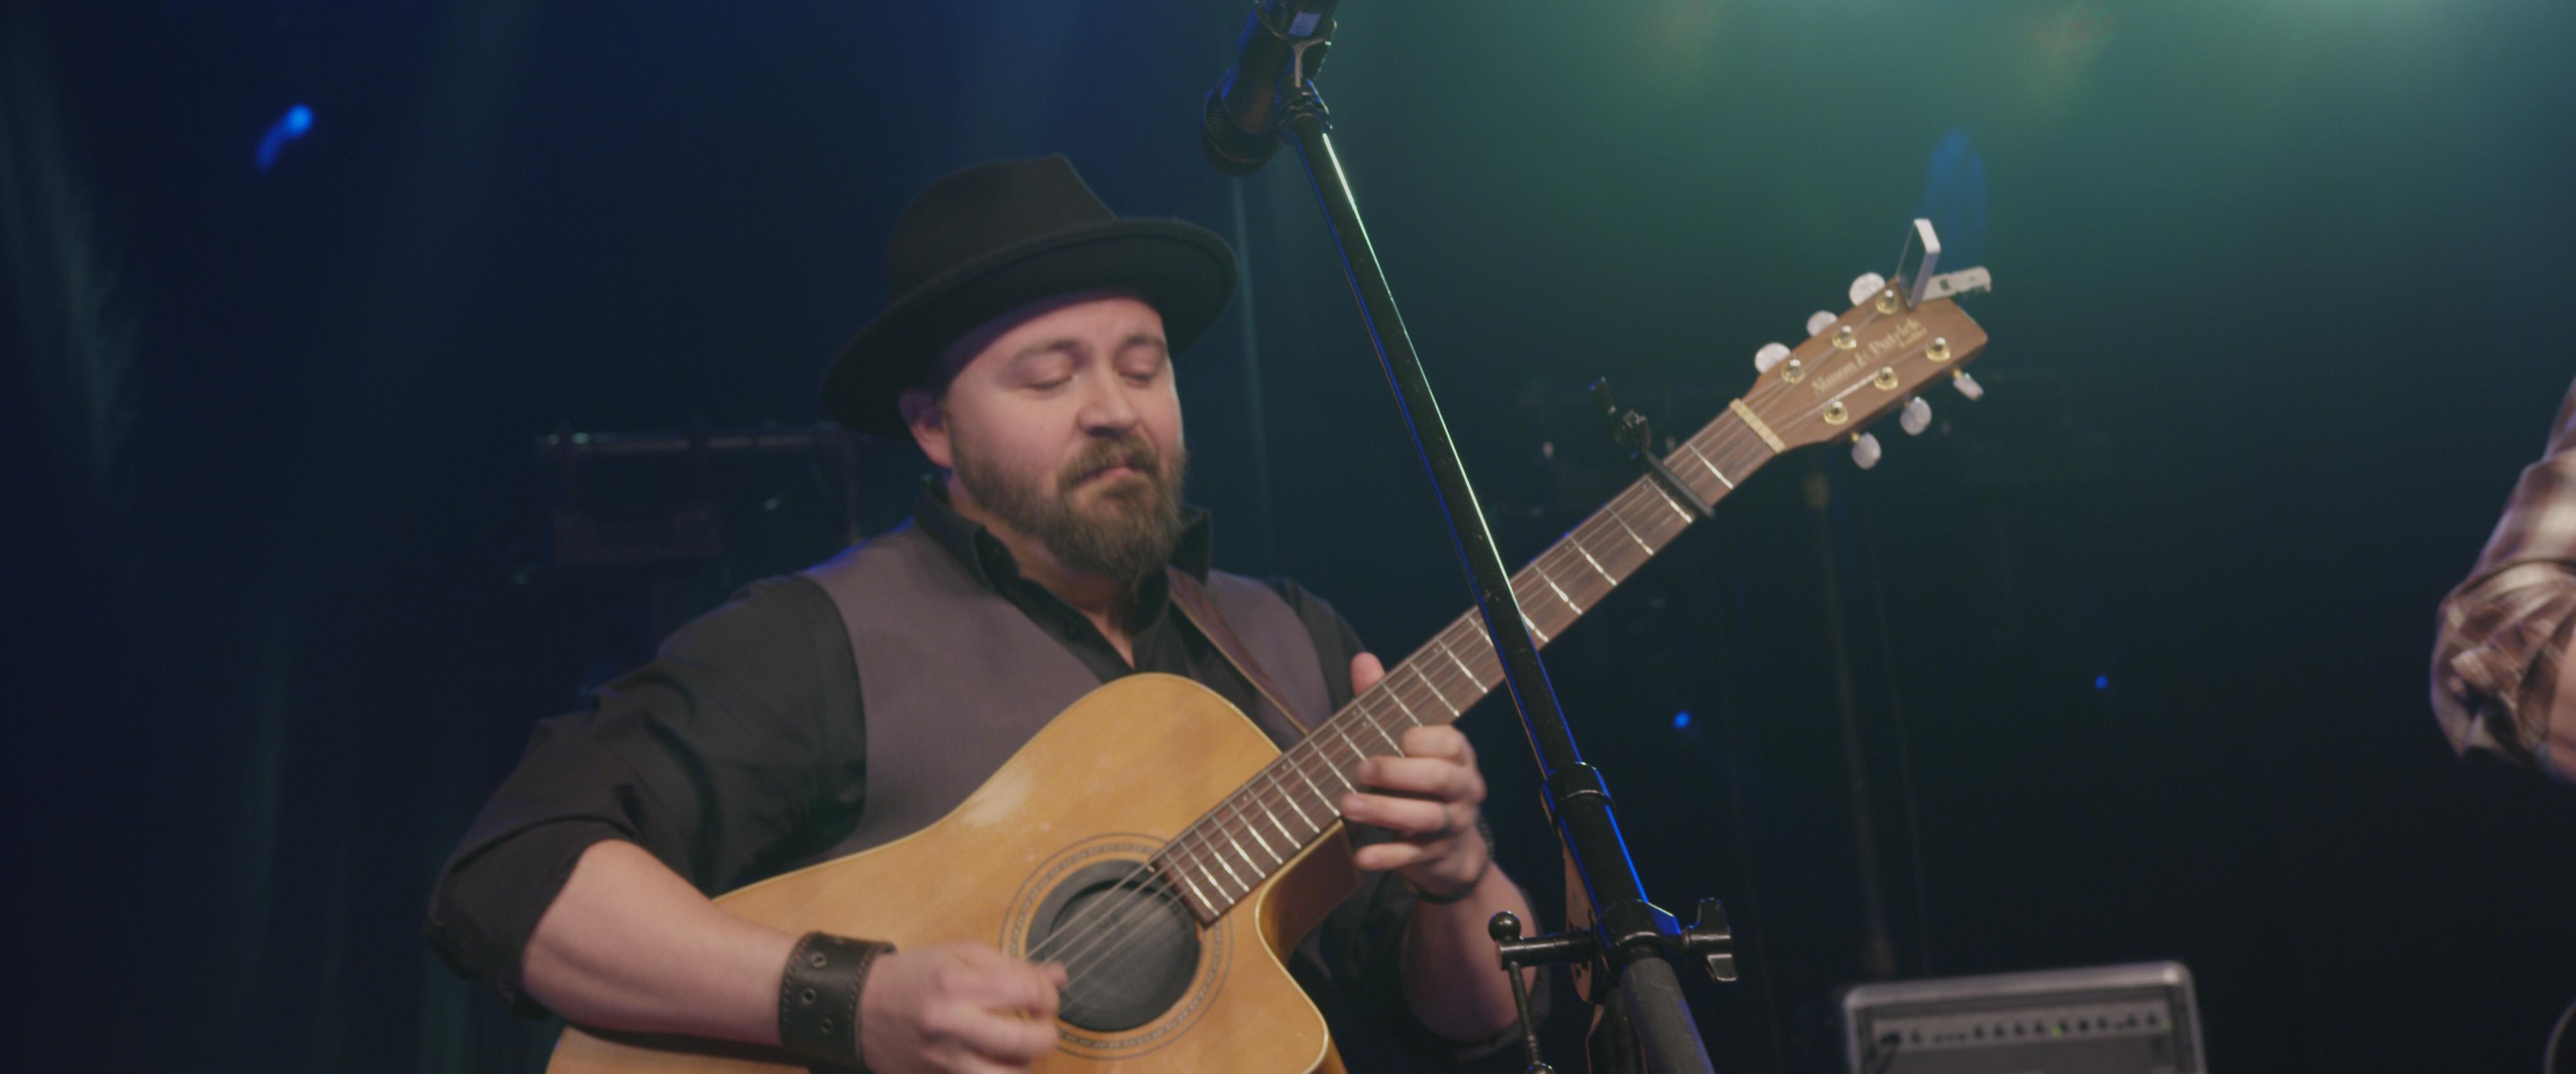 Blake Reid Band - 2017 ACMA's 18